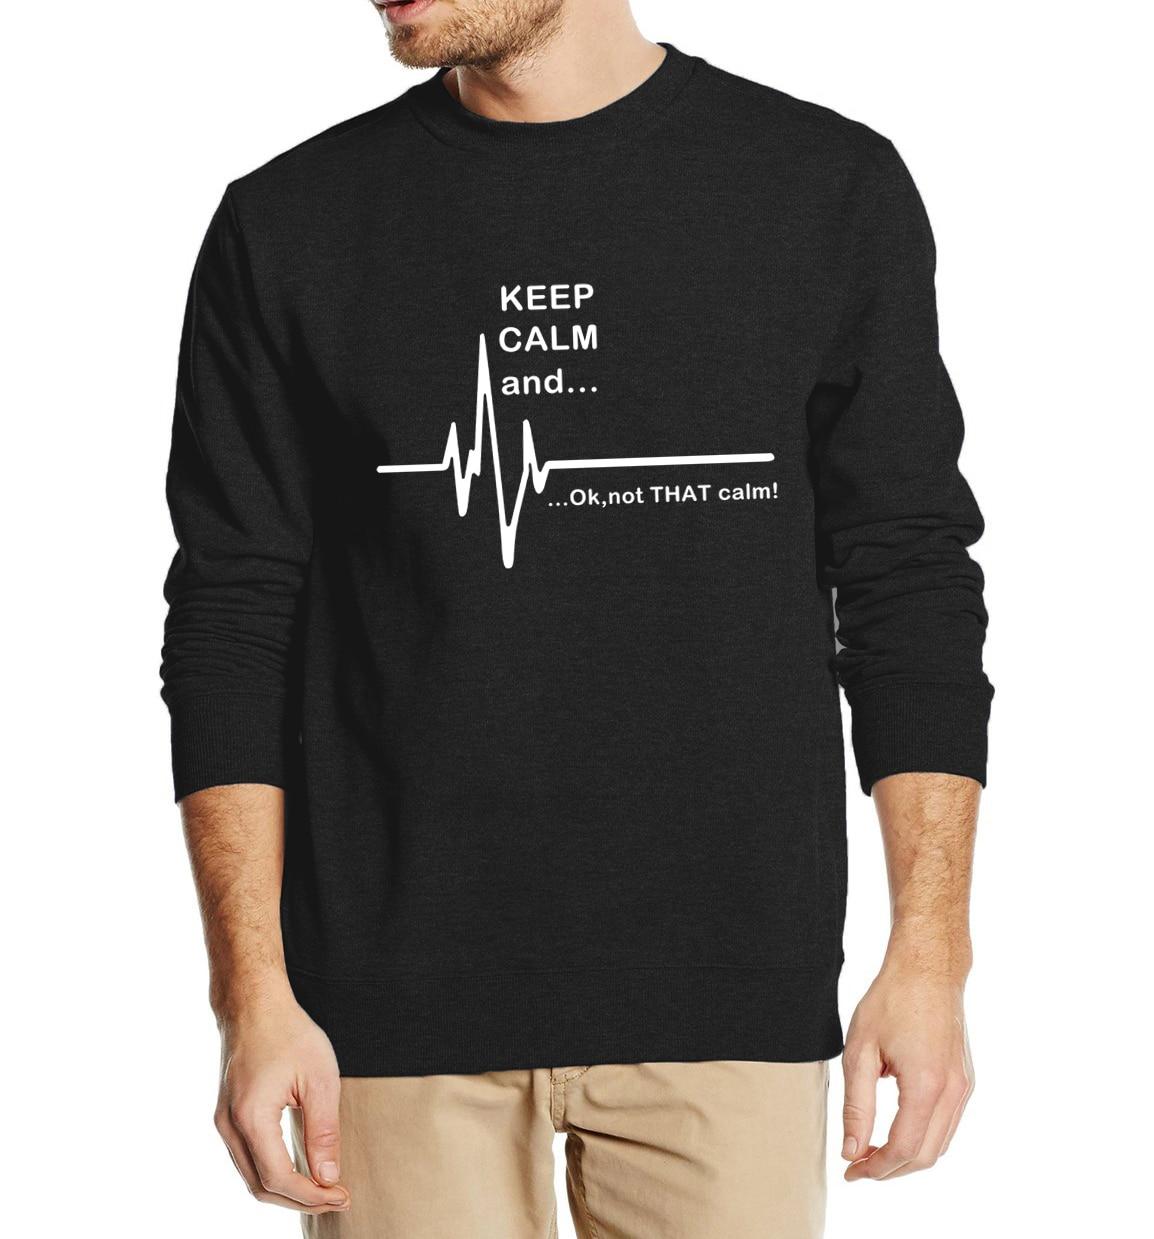 Funny men hoodies EKG Heart Rate Keep Calm and...Not That Calm letters Men Sweatshirts 2017 spring winter fleece loose hoodies